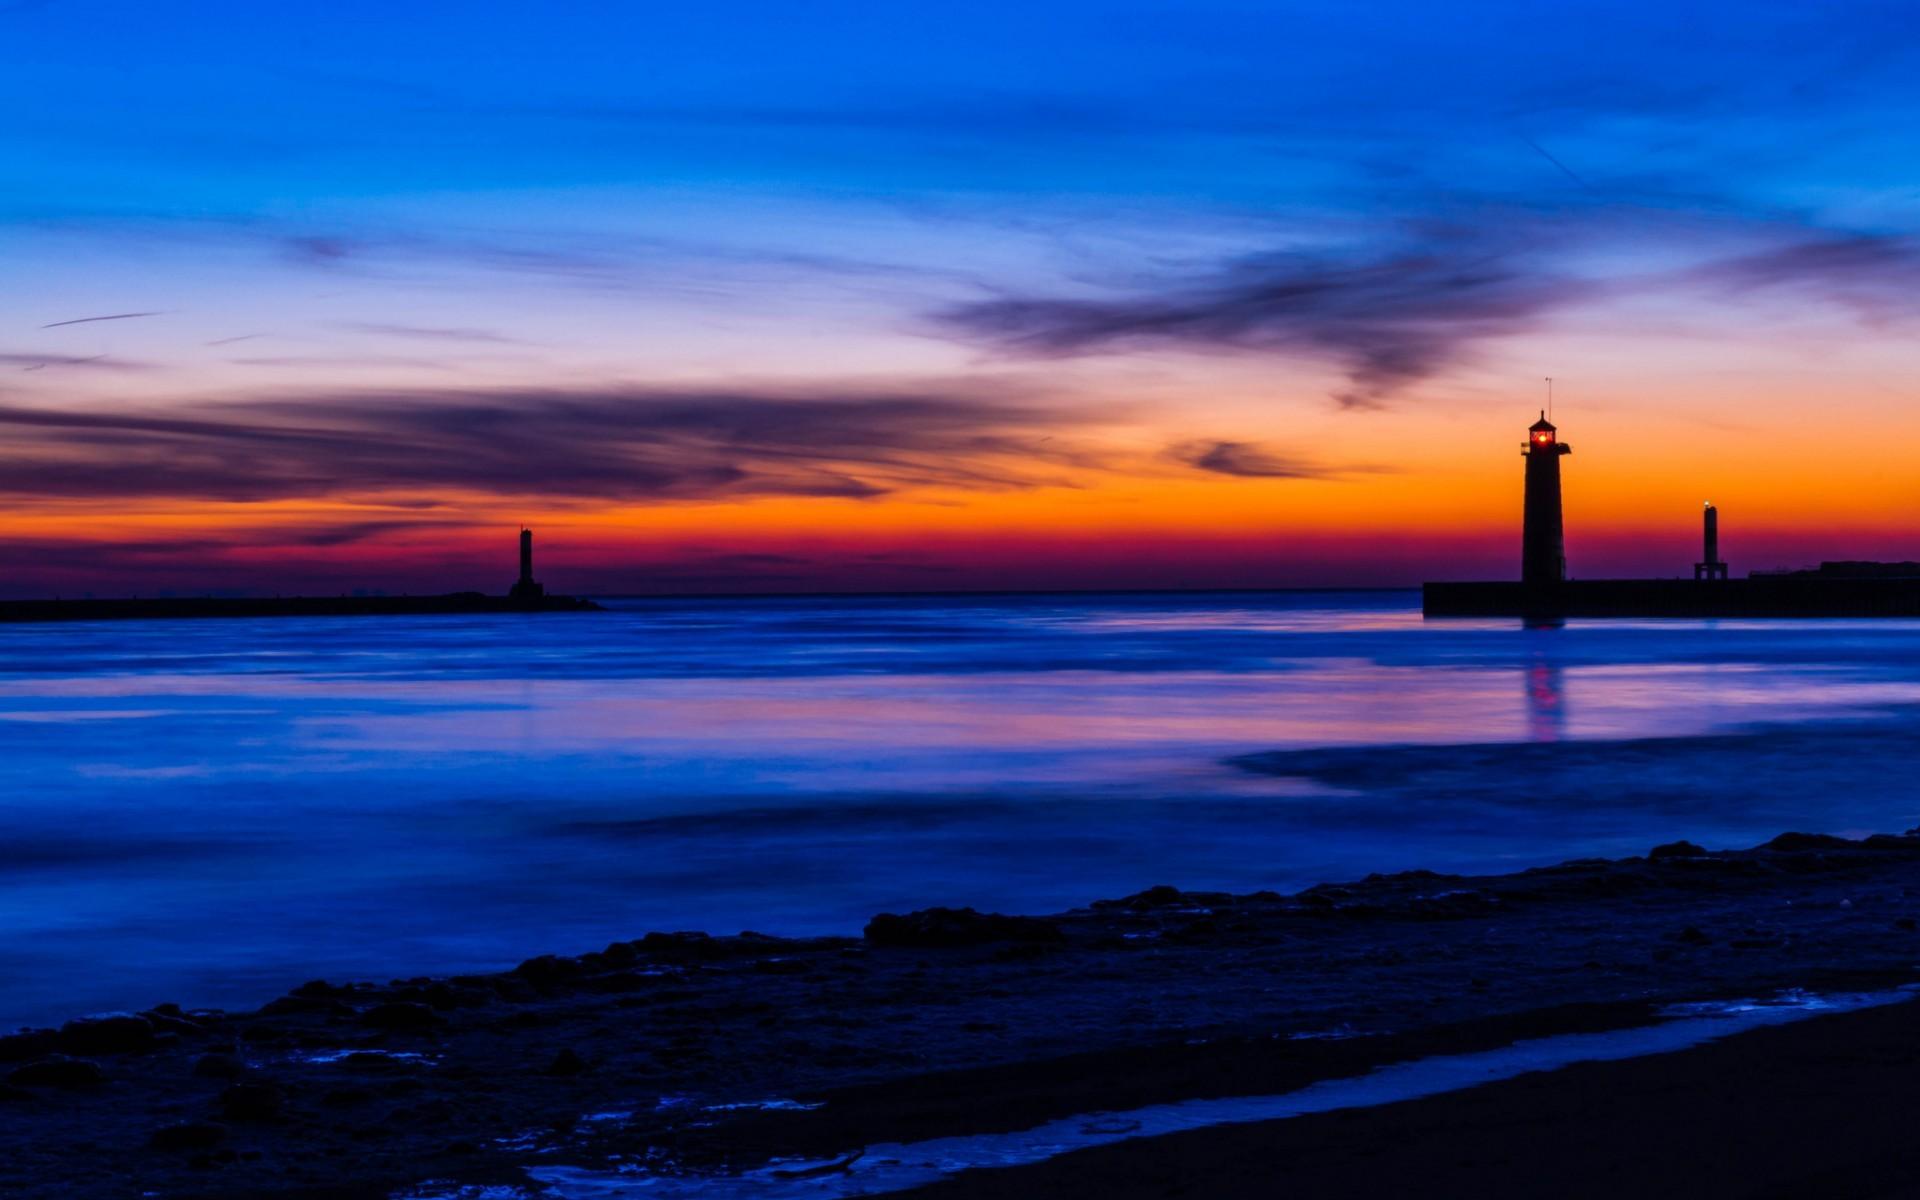 USA Michigan lake beach lighthouse night orange sunset blue sky clouds  wallpaper | | 67885 | WallpaperUP